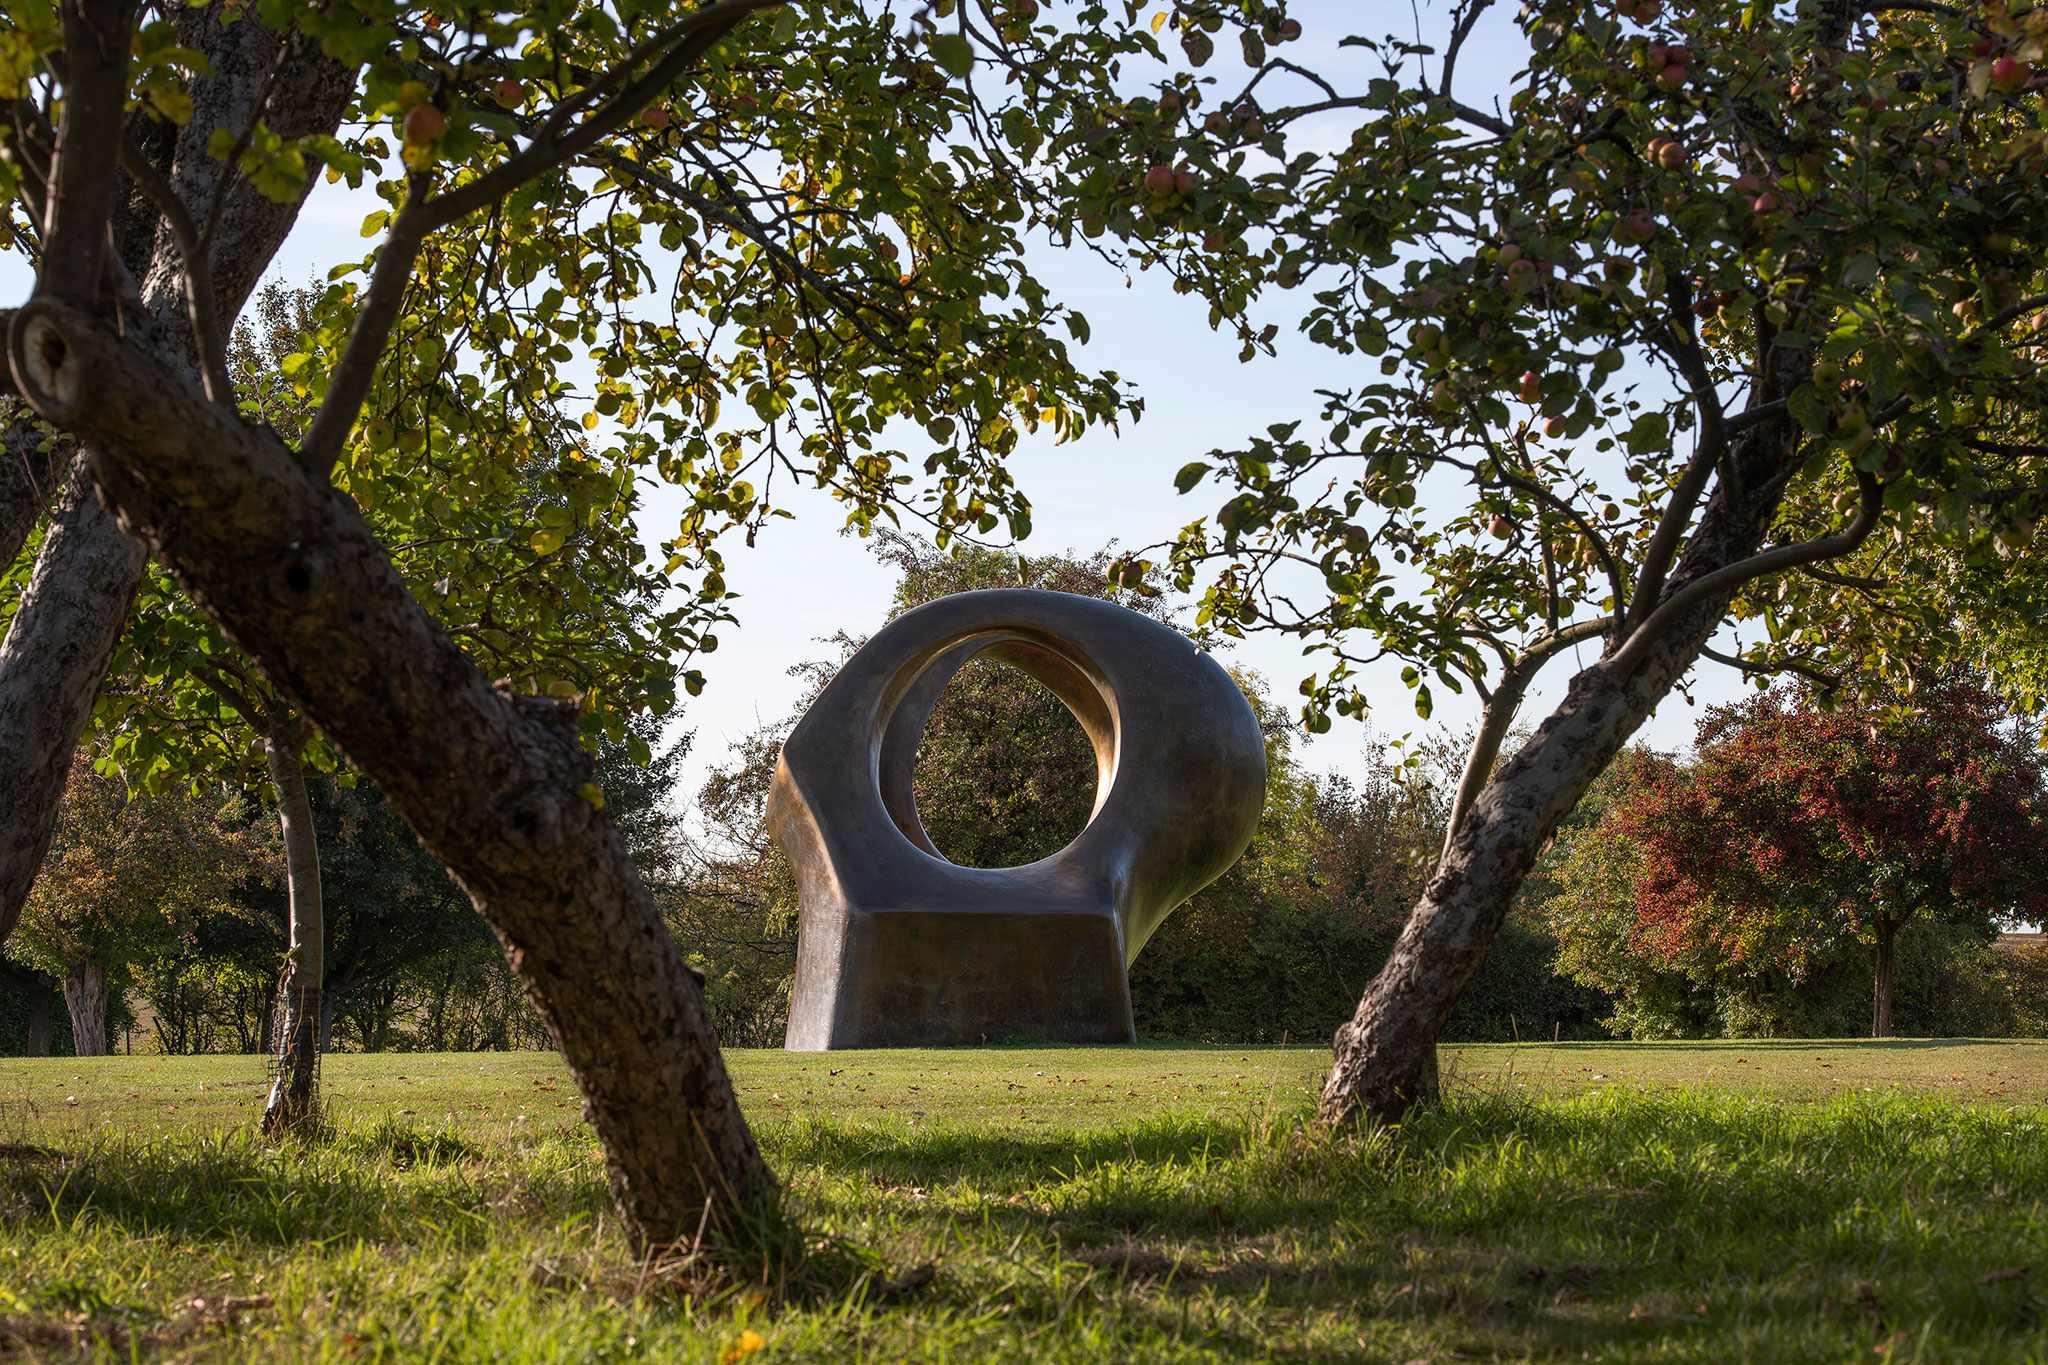 Henry Moore Studio and Gardens